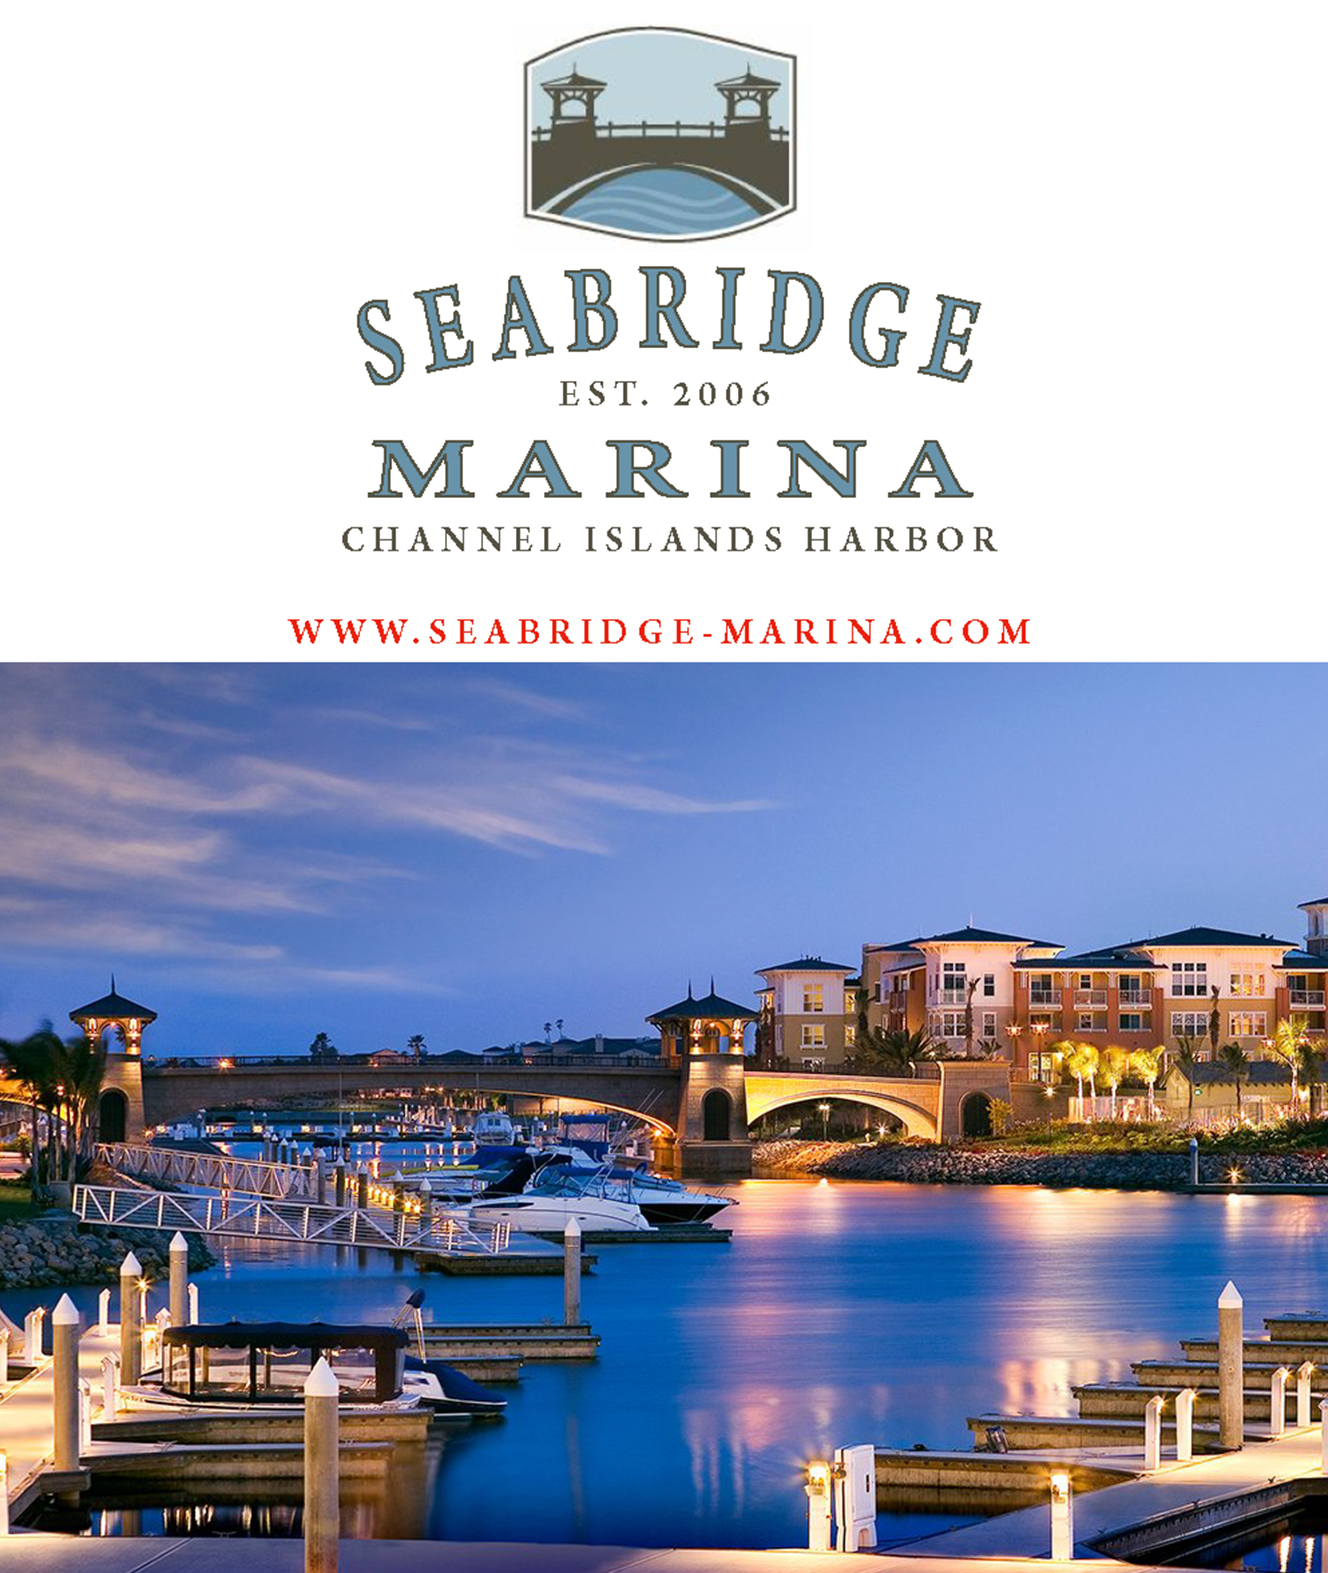 seabridge marina logo A.jpg